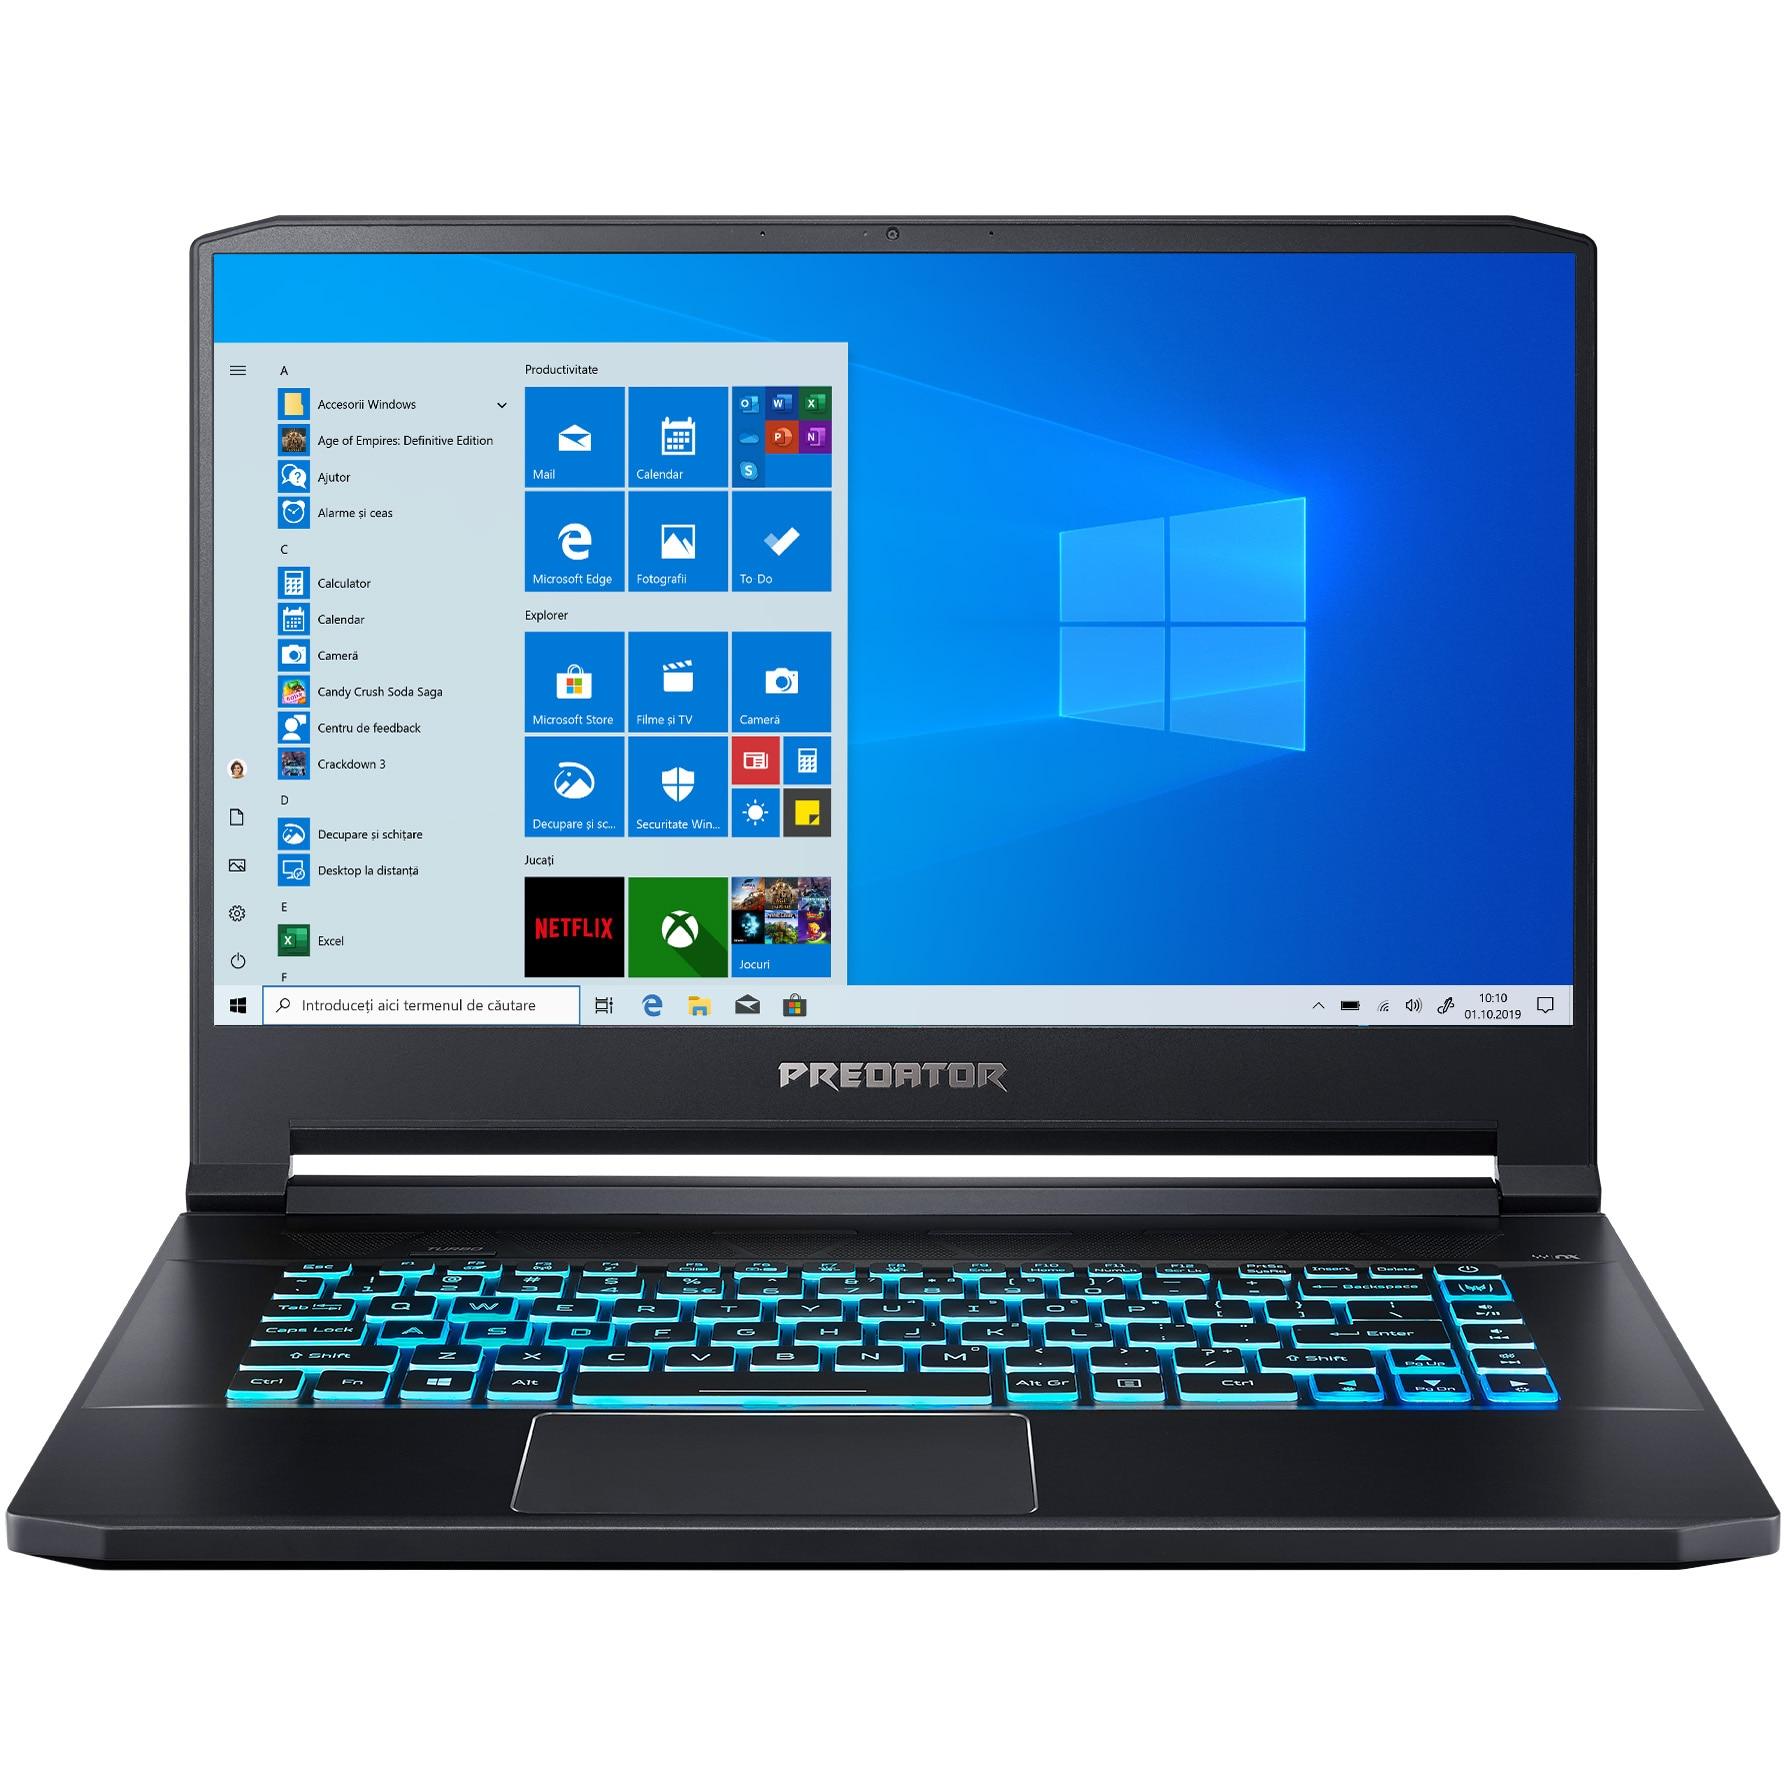 "Fotografie Laptop Gaming Acer Predator Triton 500 cu procesor Intel® Core™ i7-8750H pana la 4.10 GHz, Coffee Lake, 15.6"", Full HD, IPS, 144Hz, 32GB, 2 x 512GB SSD - RAID , NVIDIA® GeForce RTX™ 2080 8GB, Microsoft Windows 10, Abyssal Black"